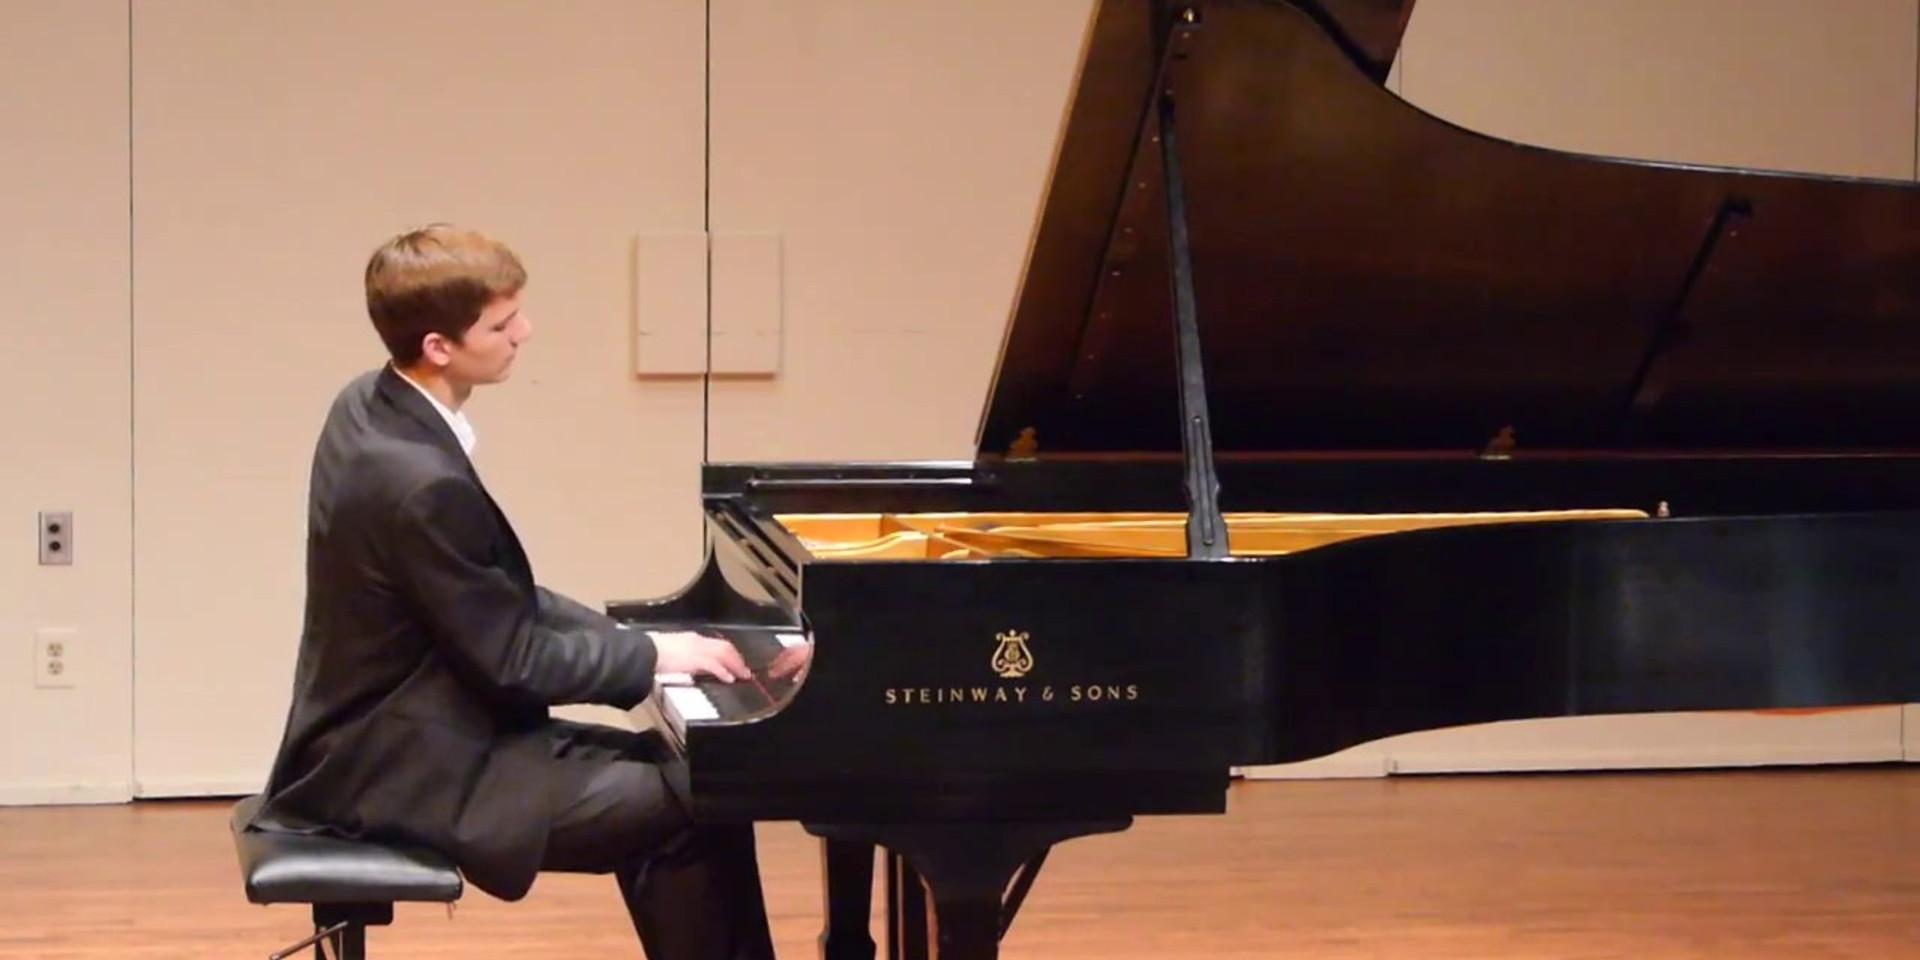 Mendelssohn: Variations Sérieuses in d minor